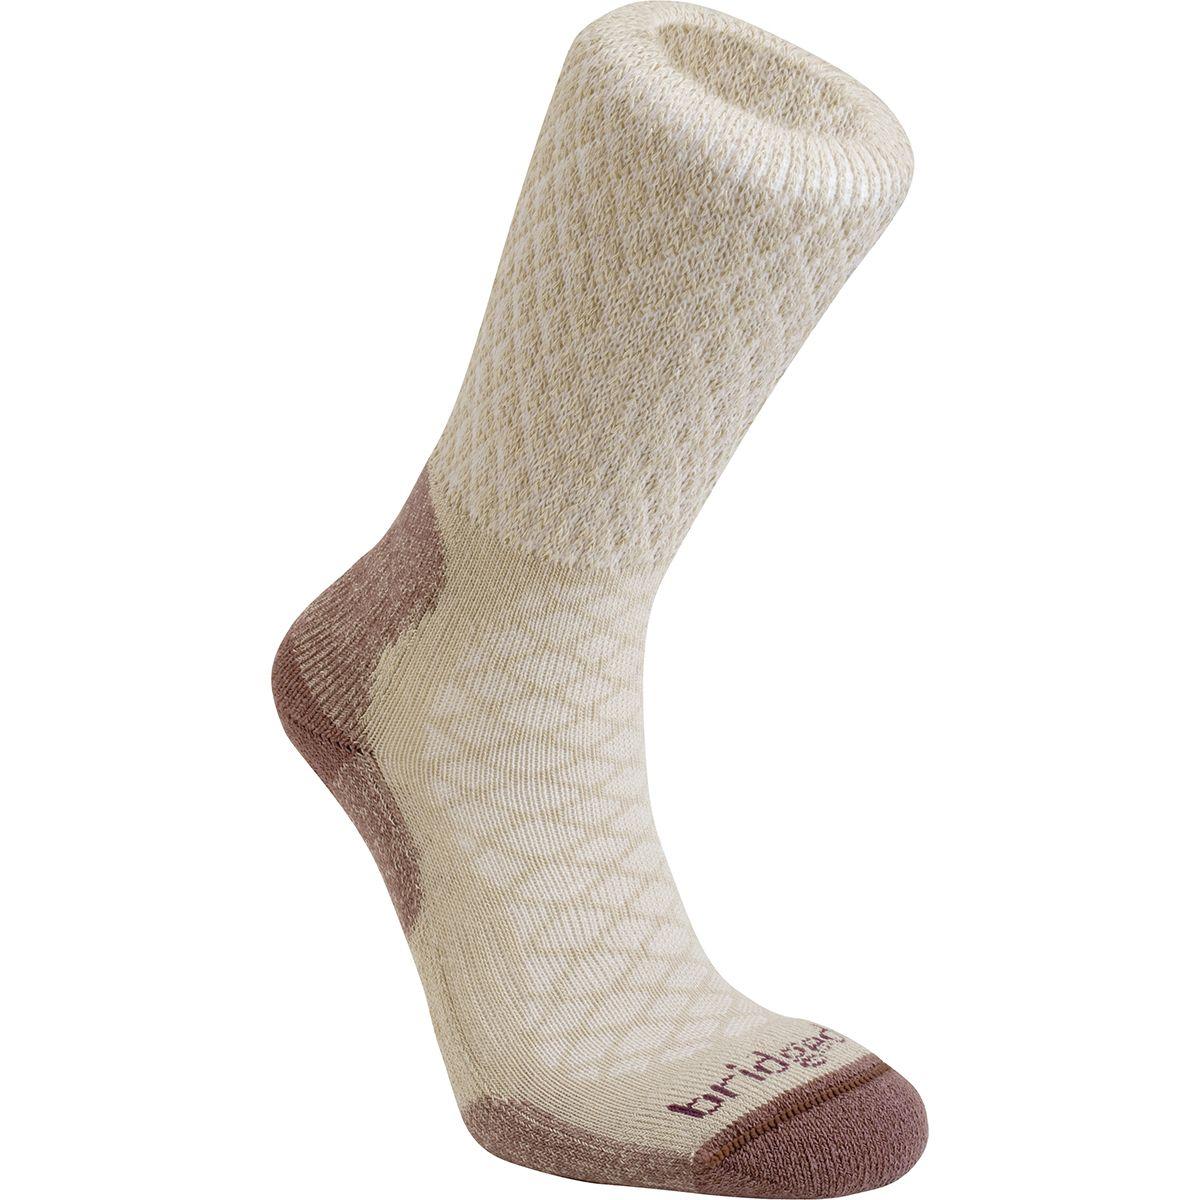 Bridgedale Hike Lightweight Boot Merino Comfort